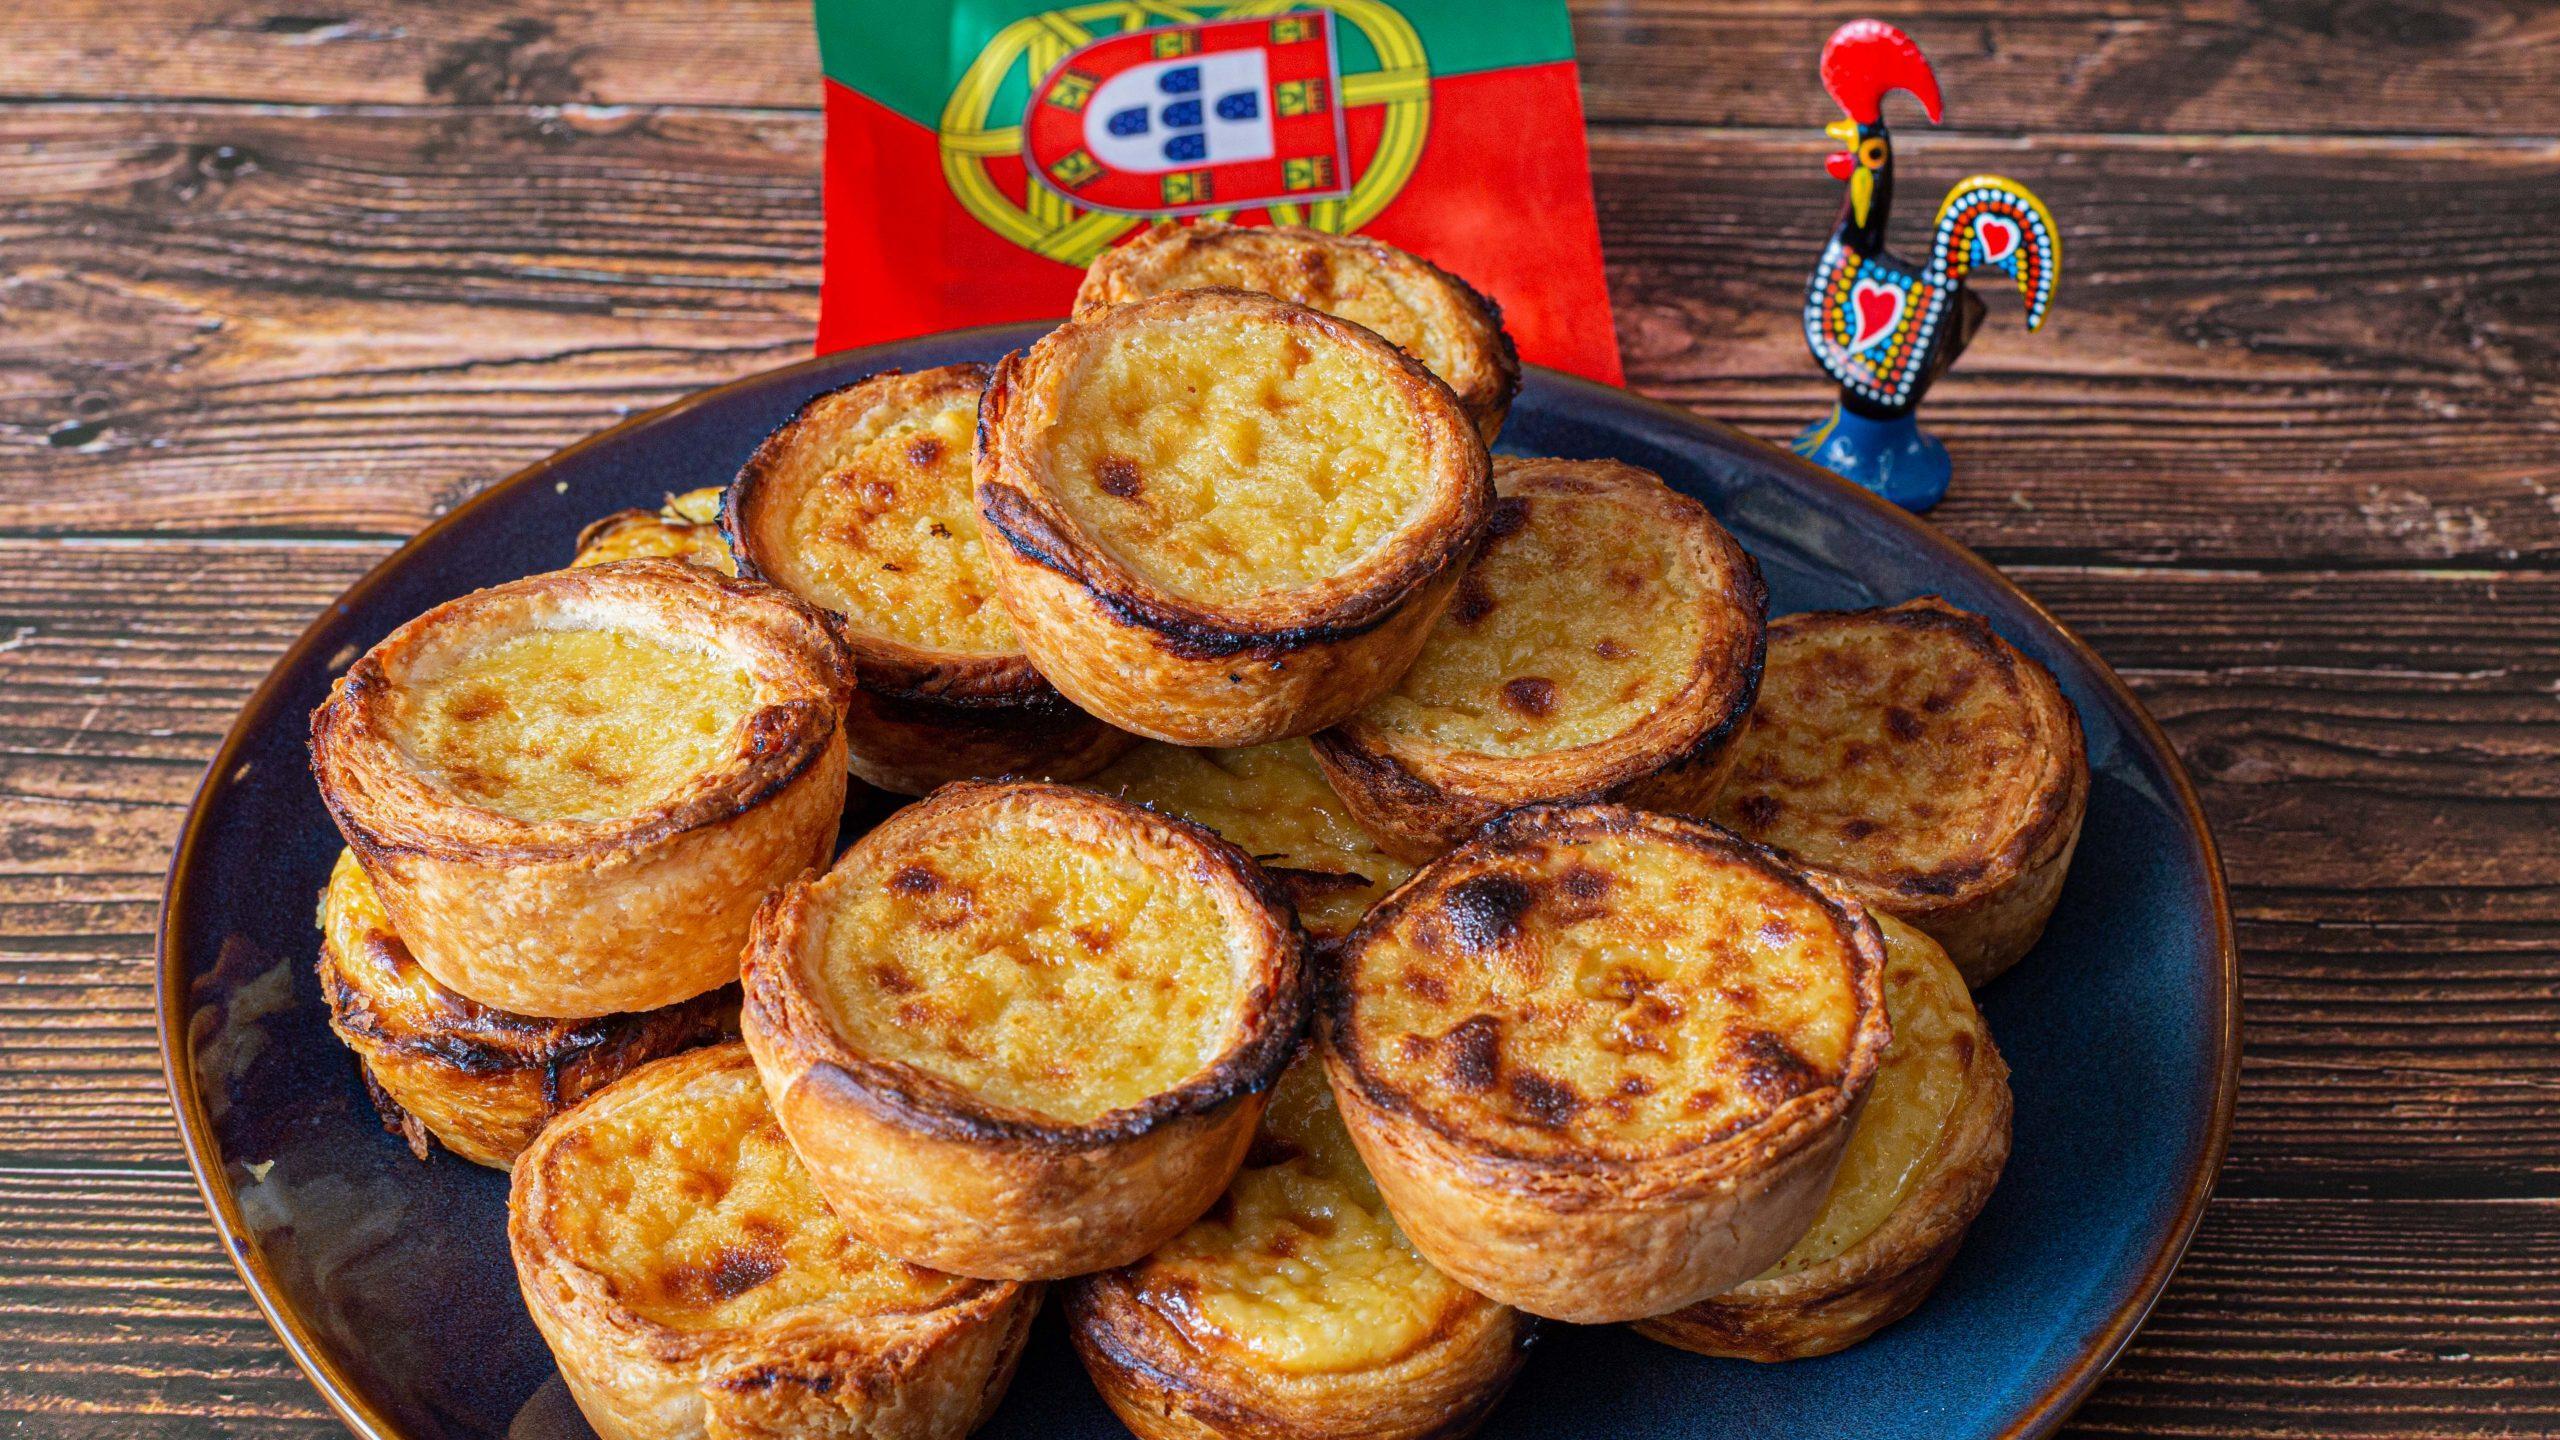 Pasteis de Nata, Portuguese Custard Tarts stacked